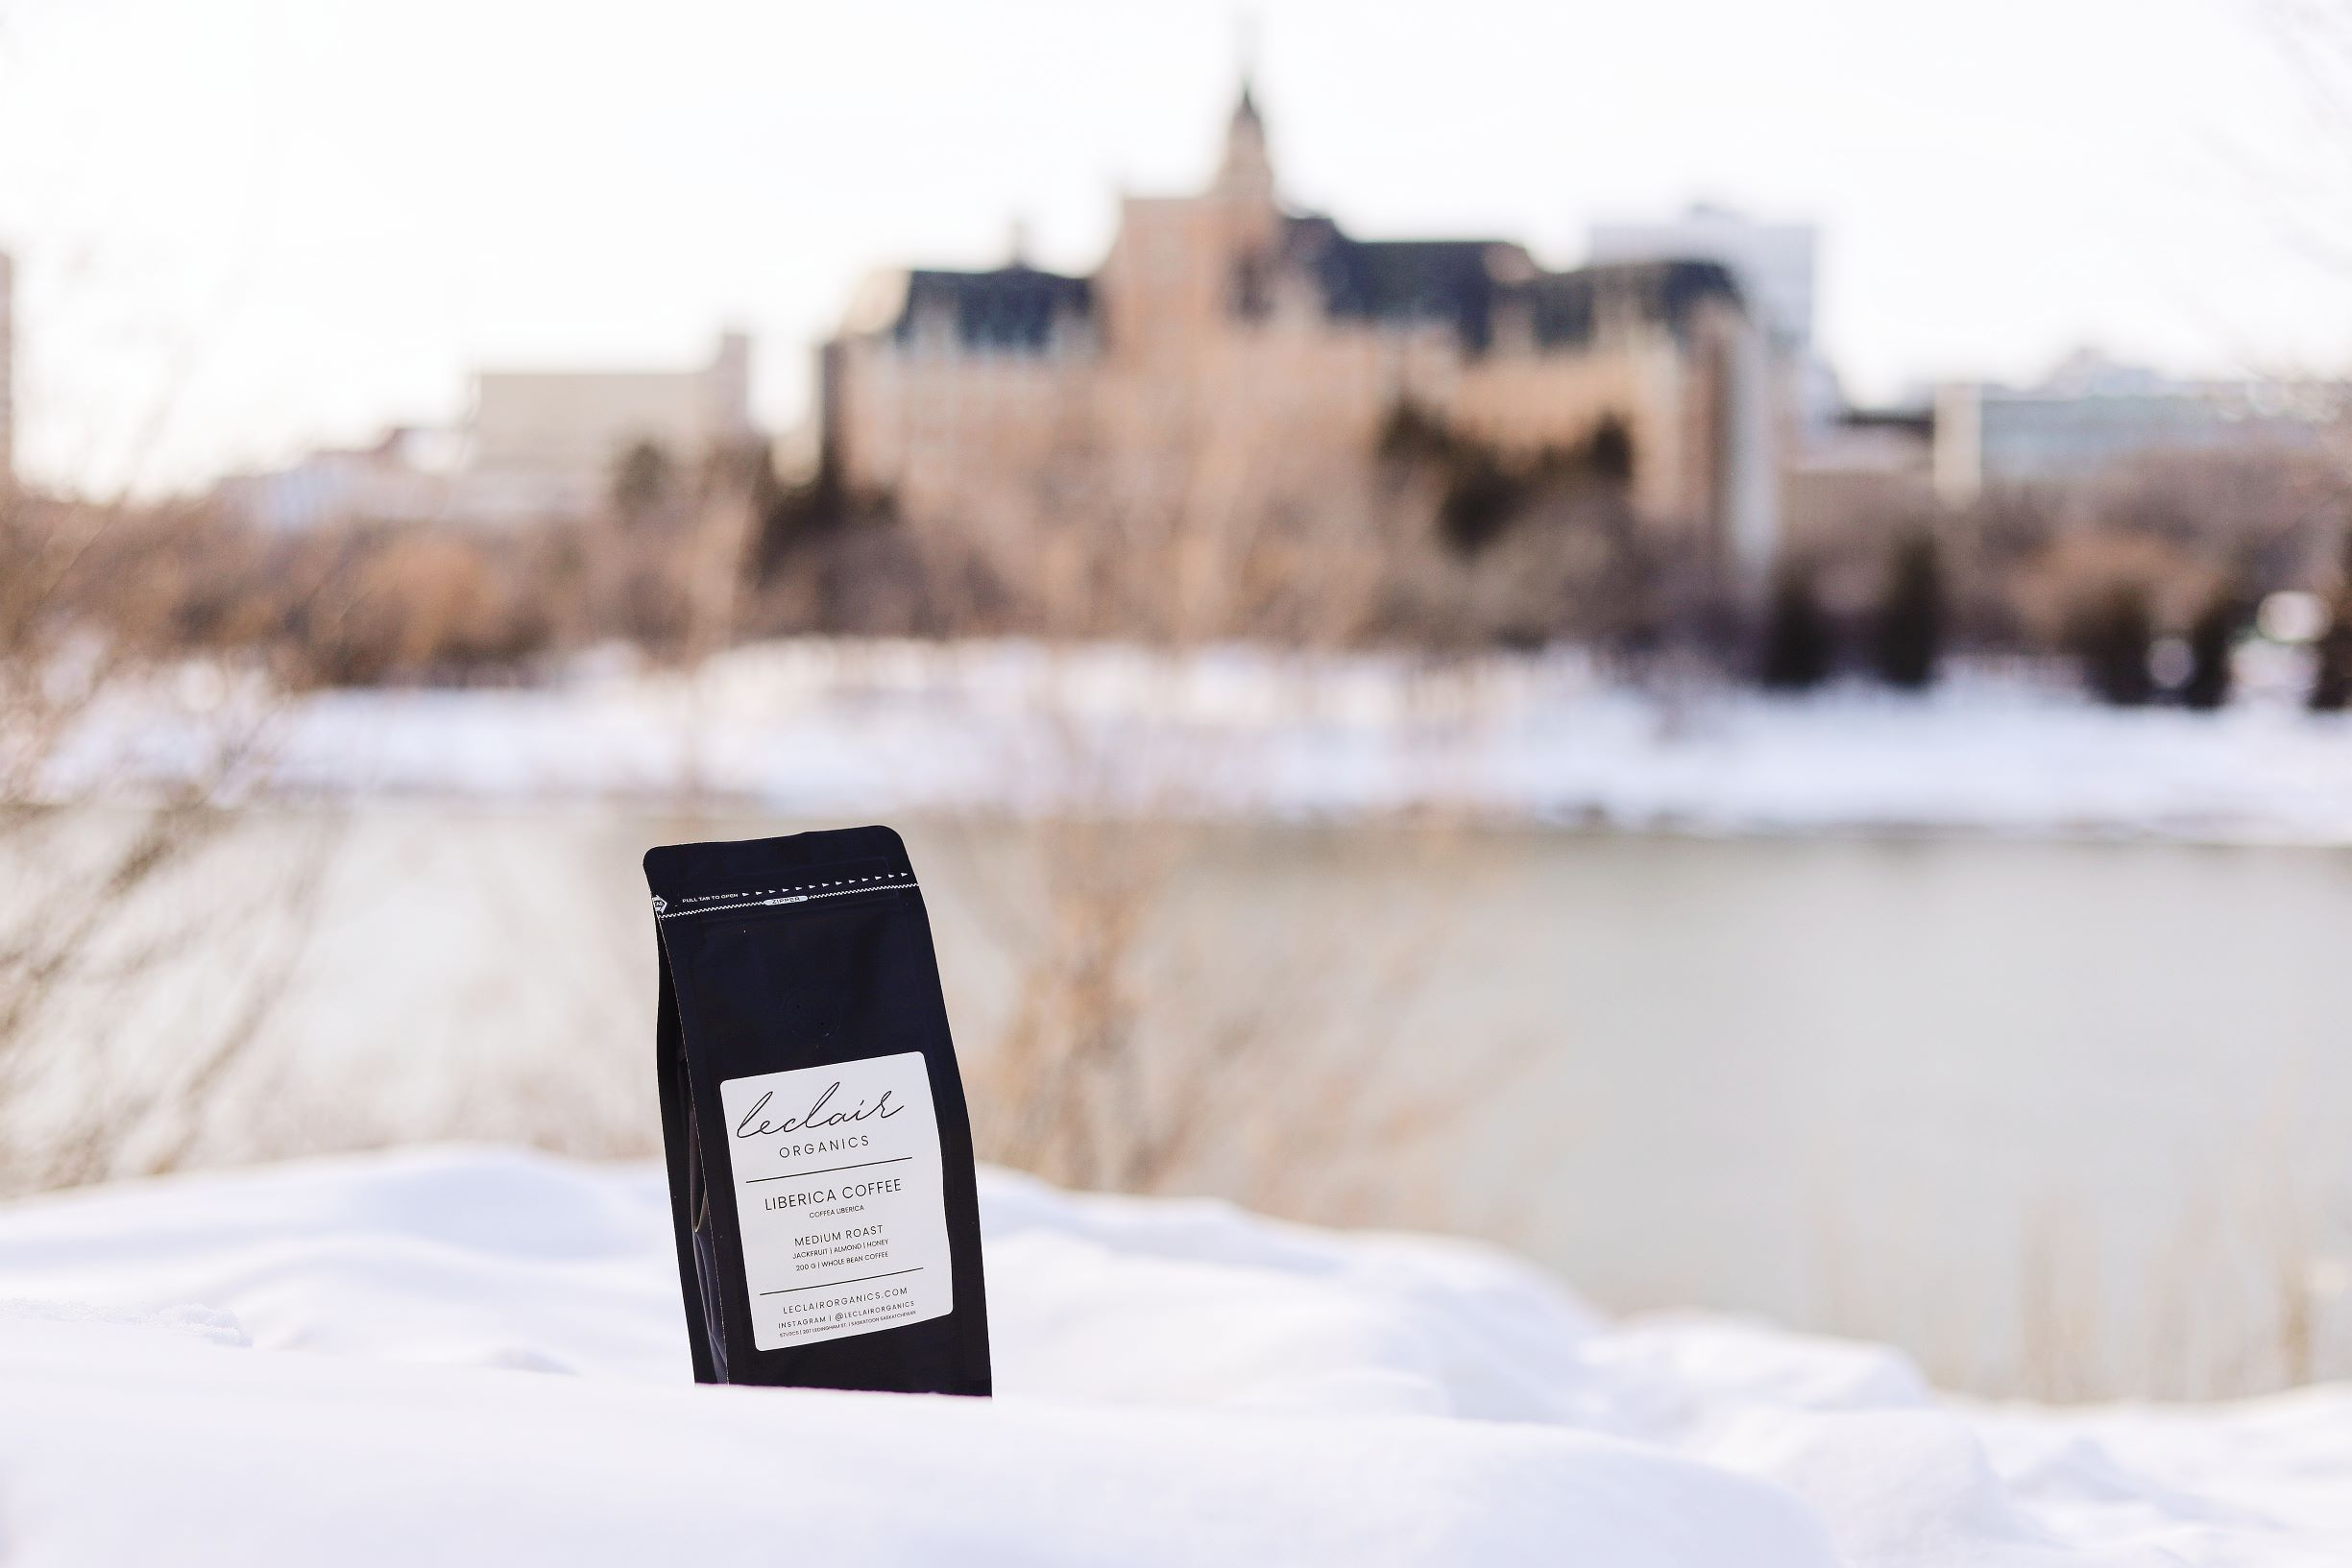 Liberica Coffee Saskatoon, Coffee Roasters Saskatoon, liberica coffee bag in front of delta bessborough